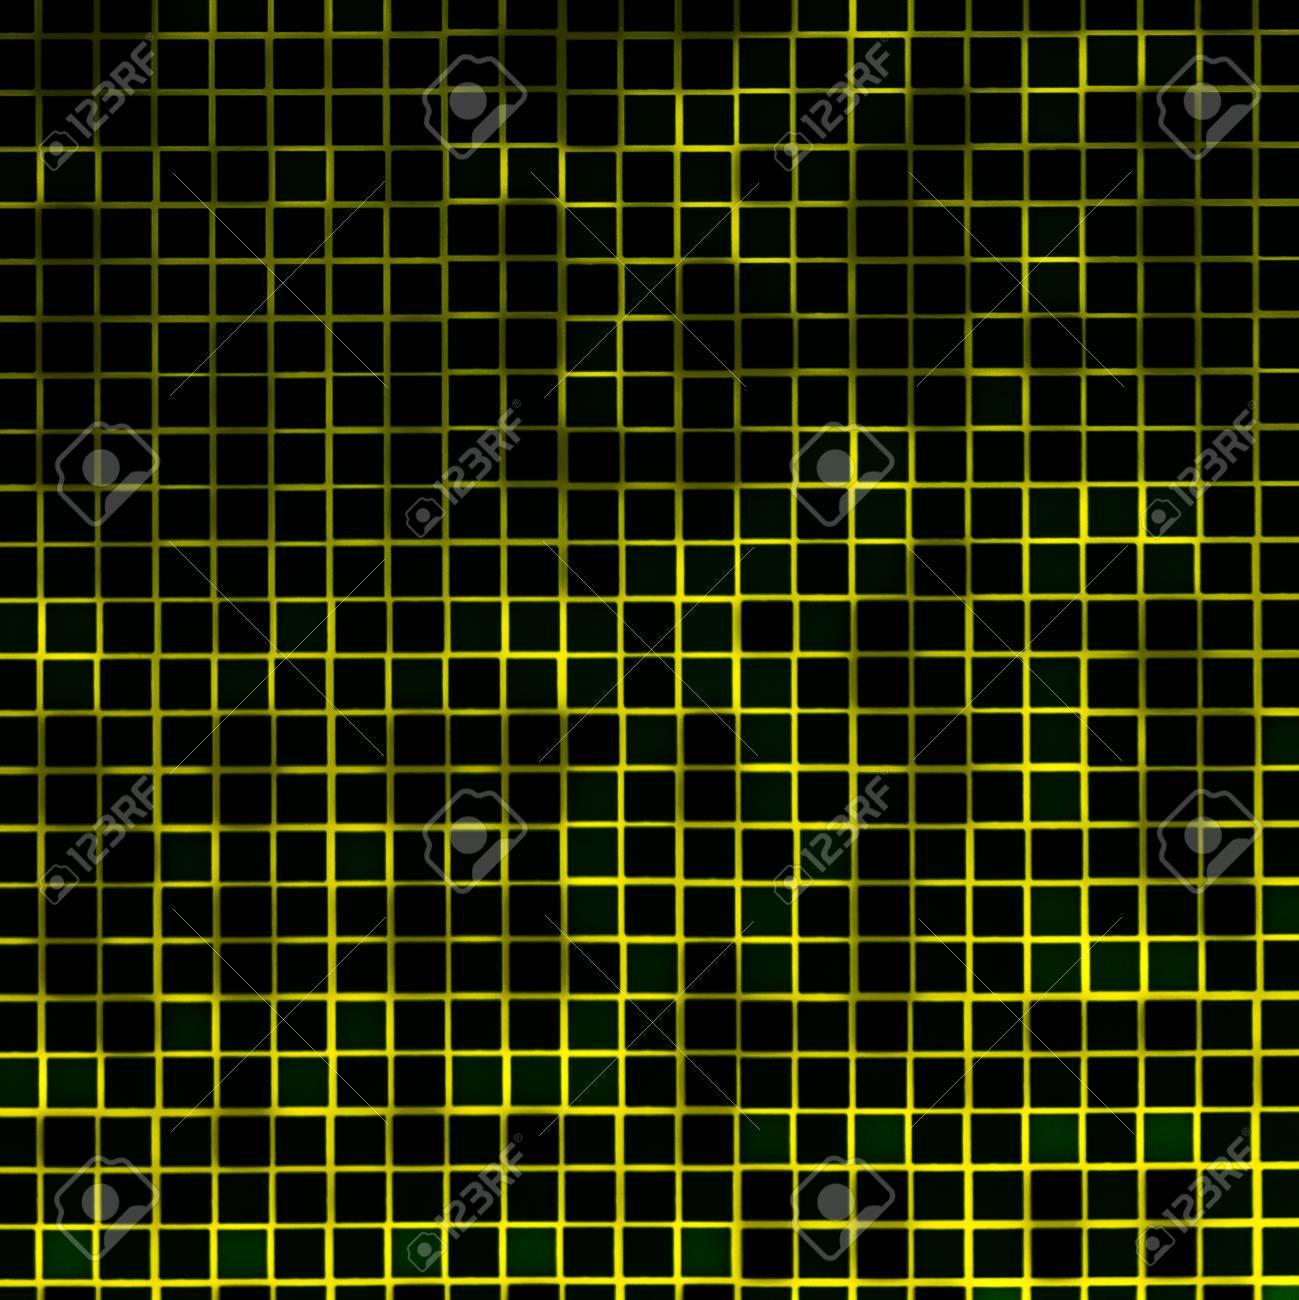 Geometric Modern Mosaic Grid Tiles - 123325259